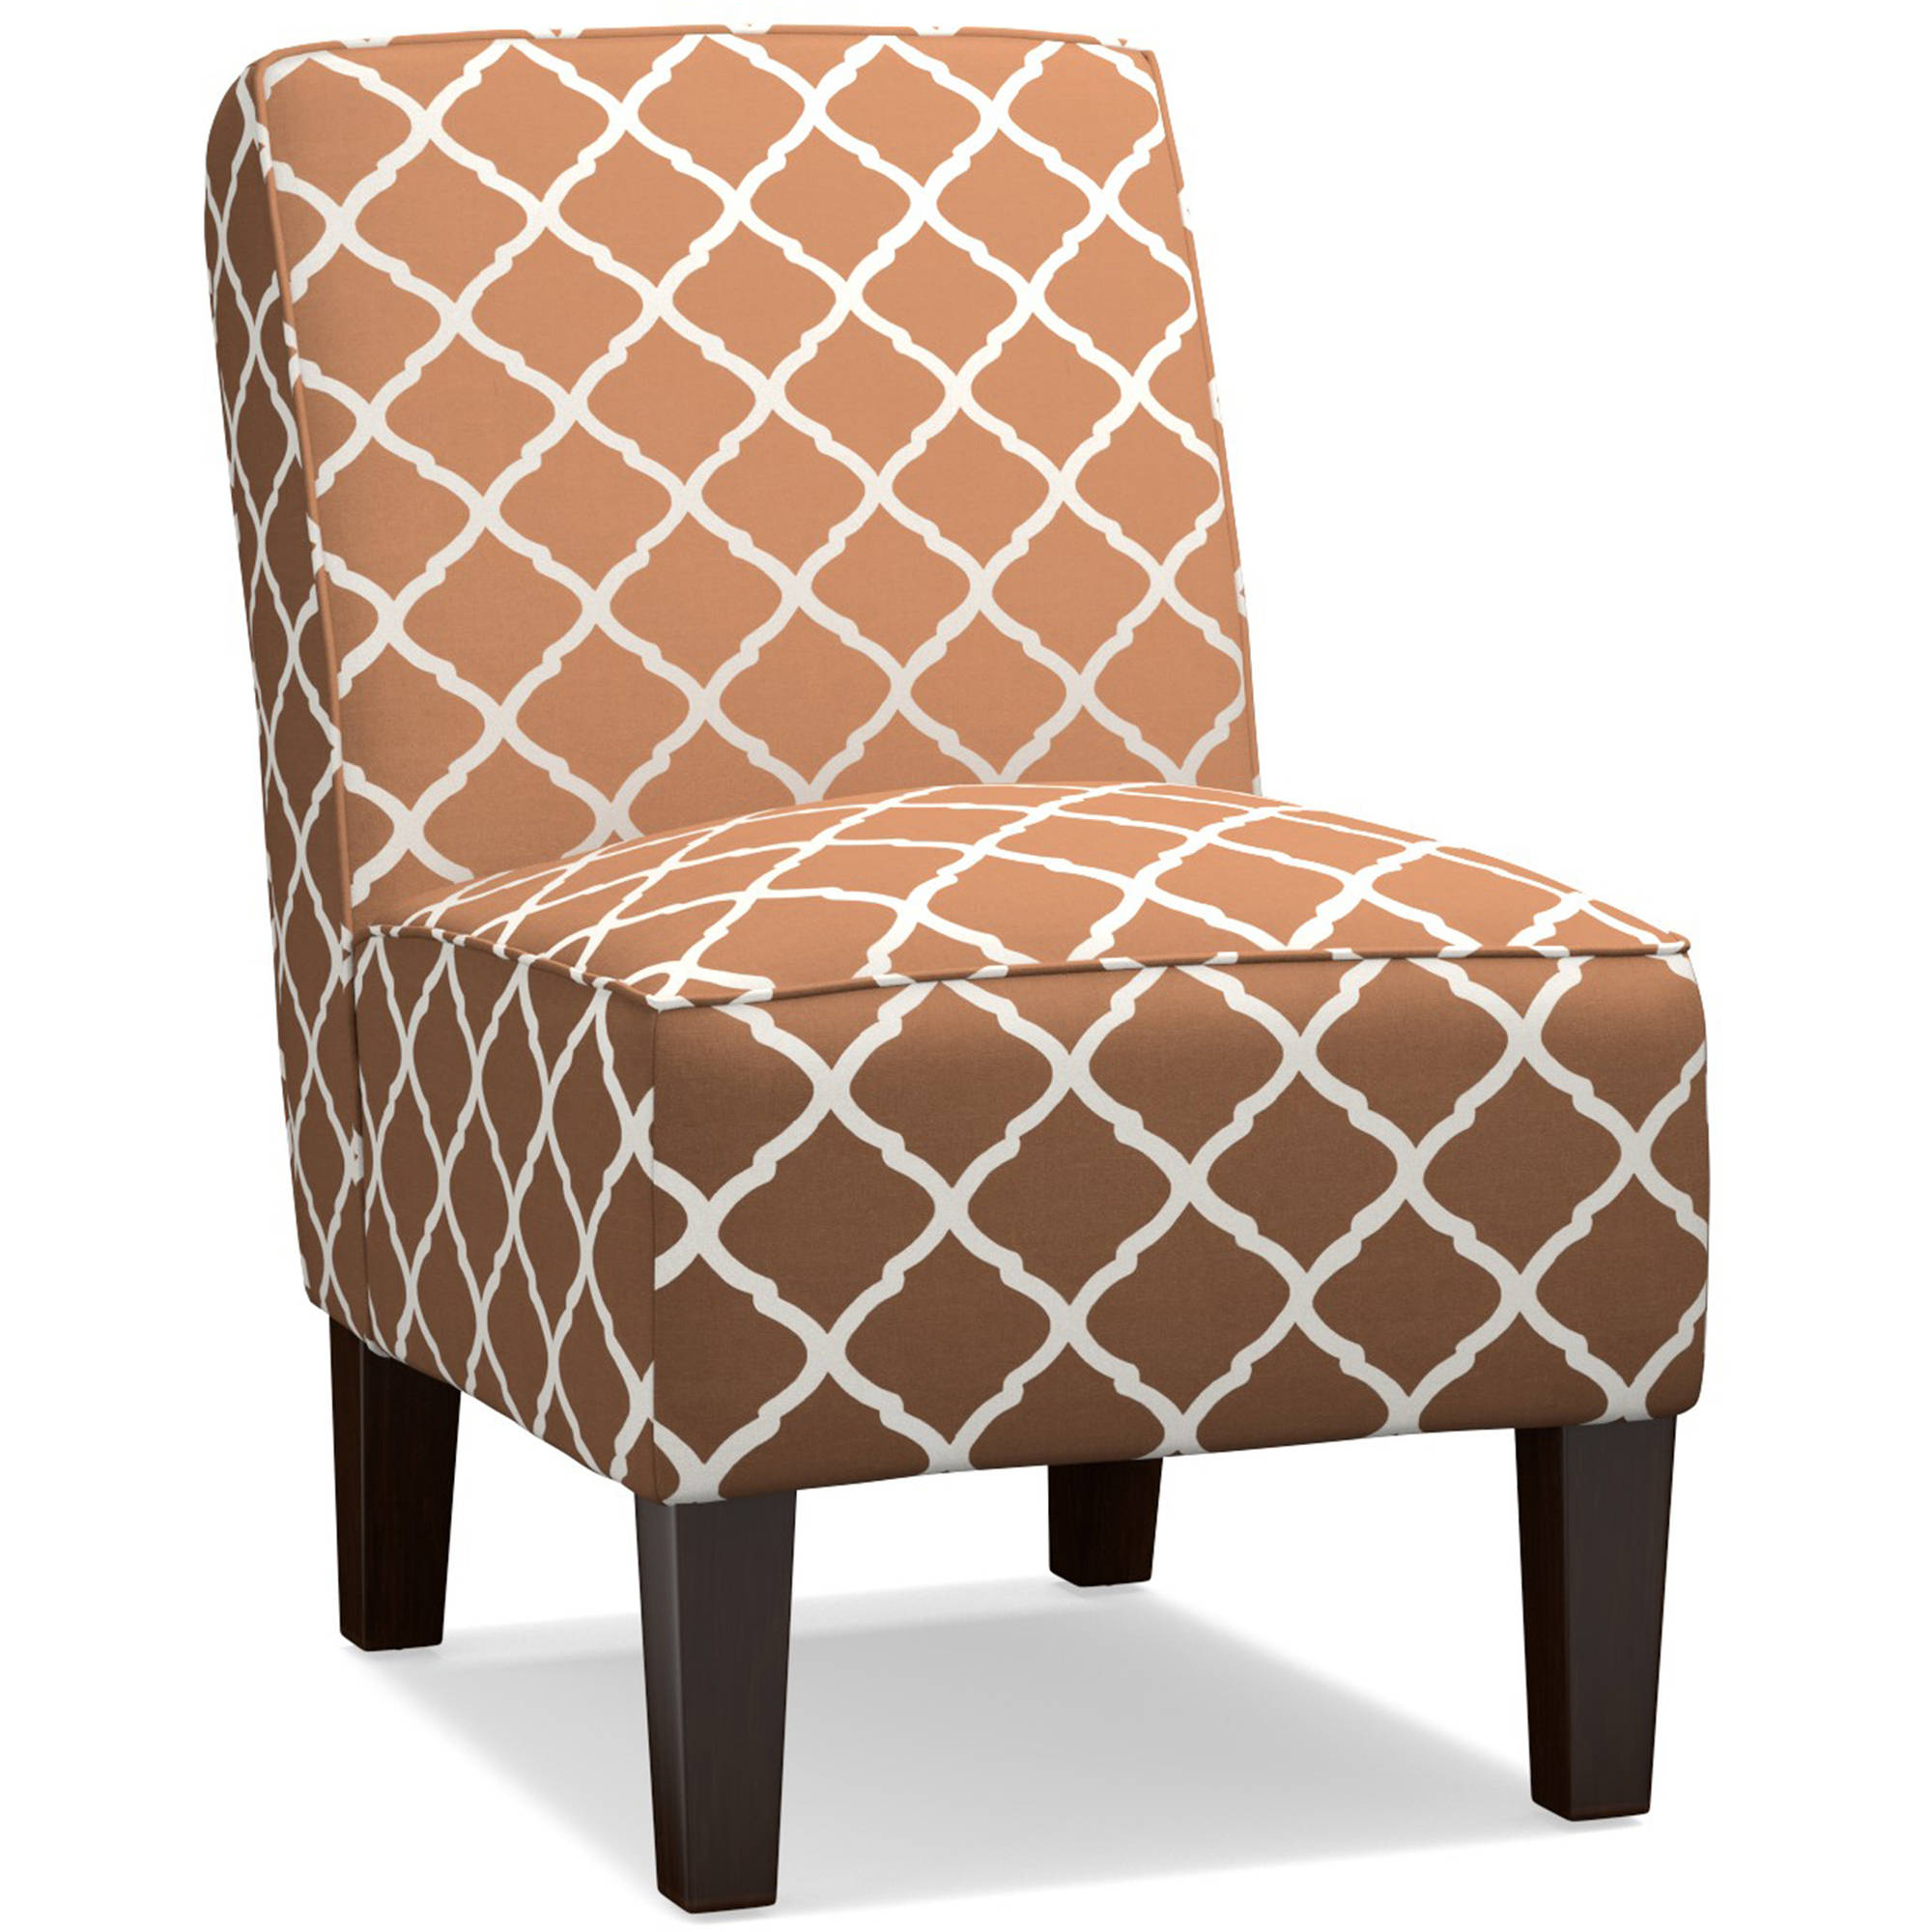 Accent Chairs Under $100   Walmart.com